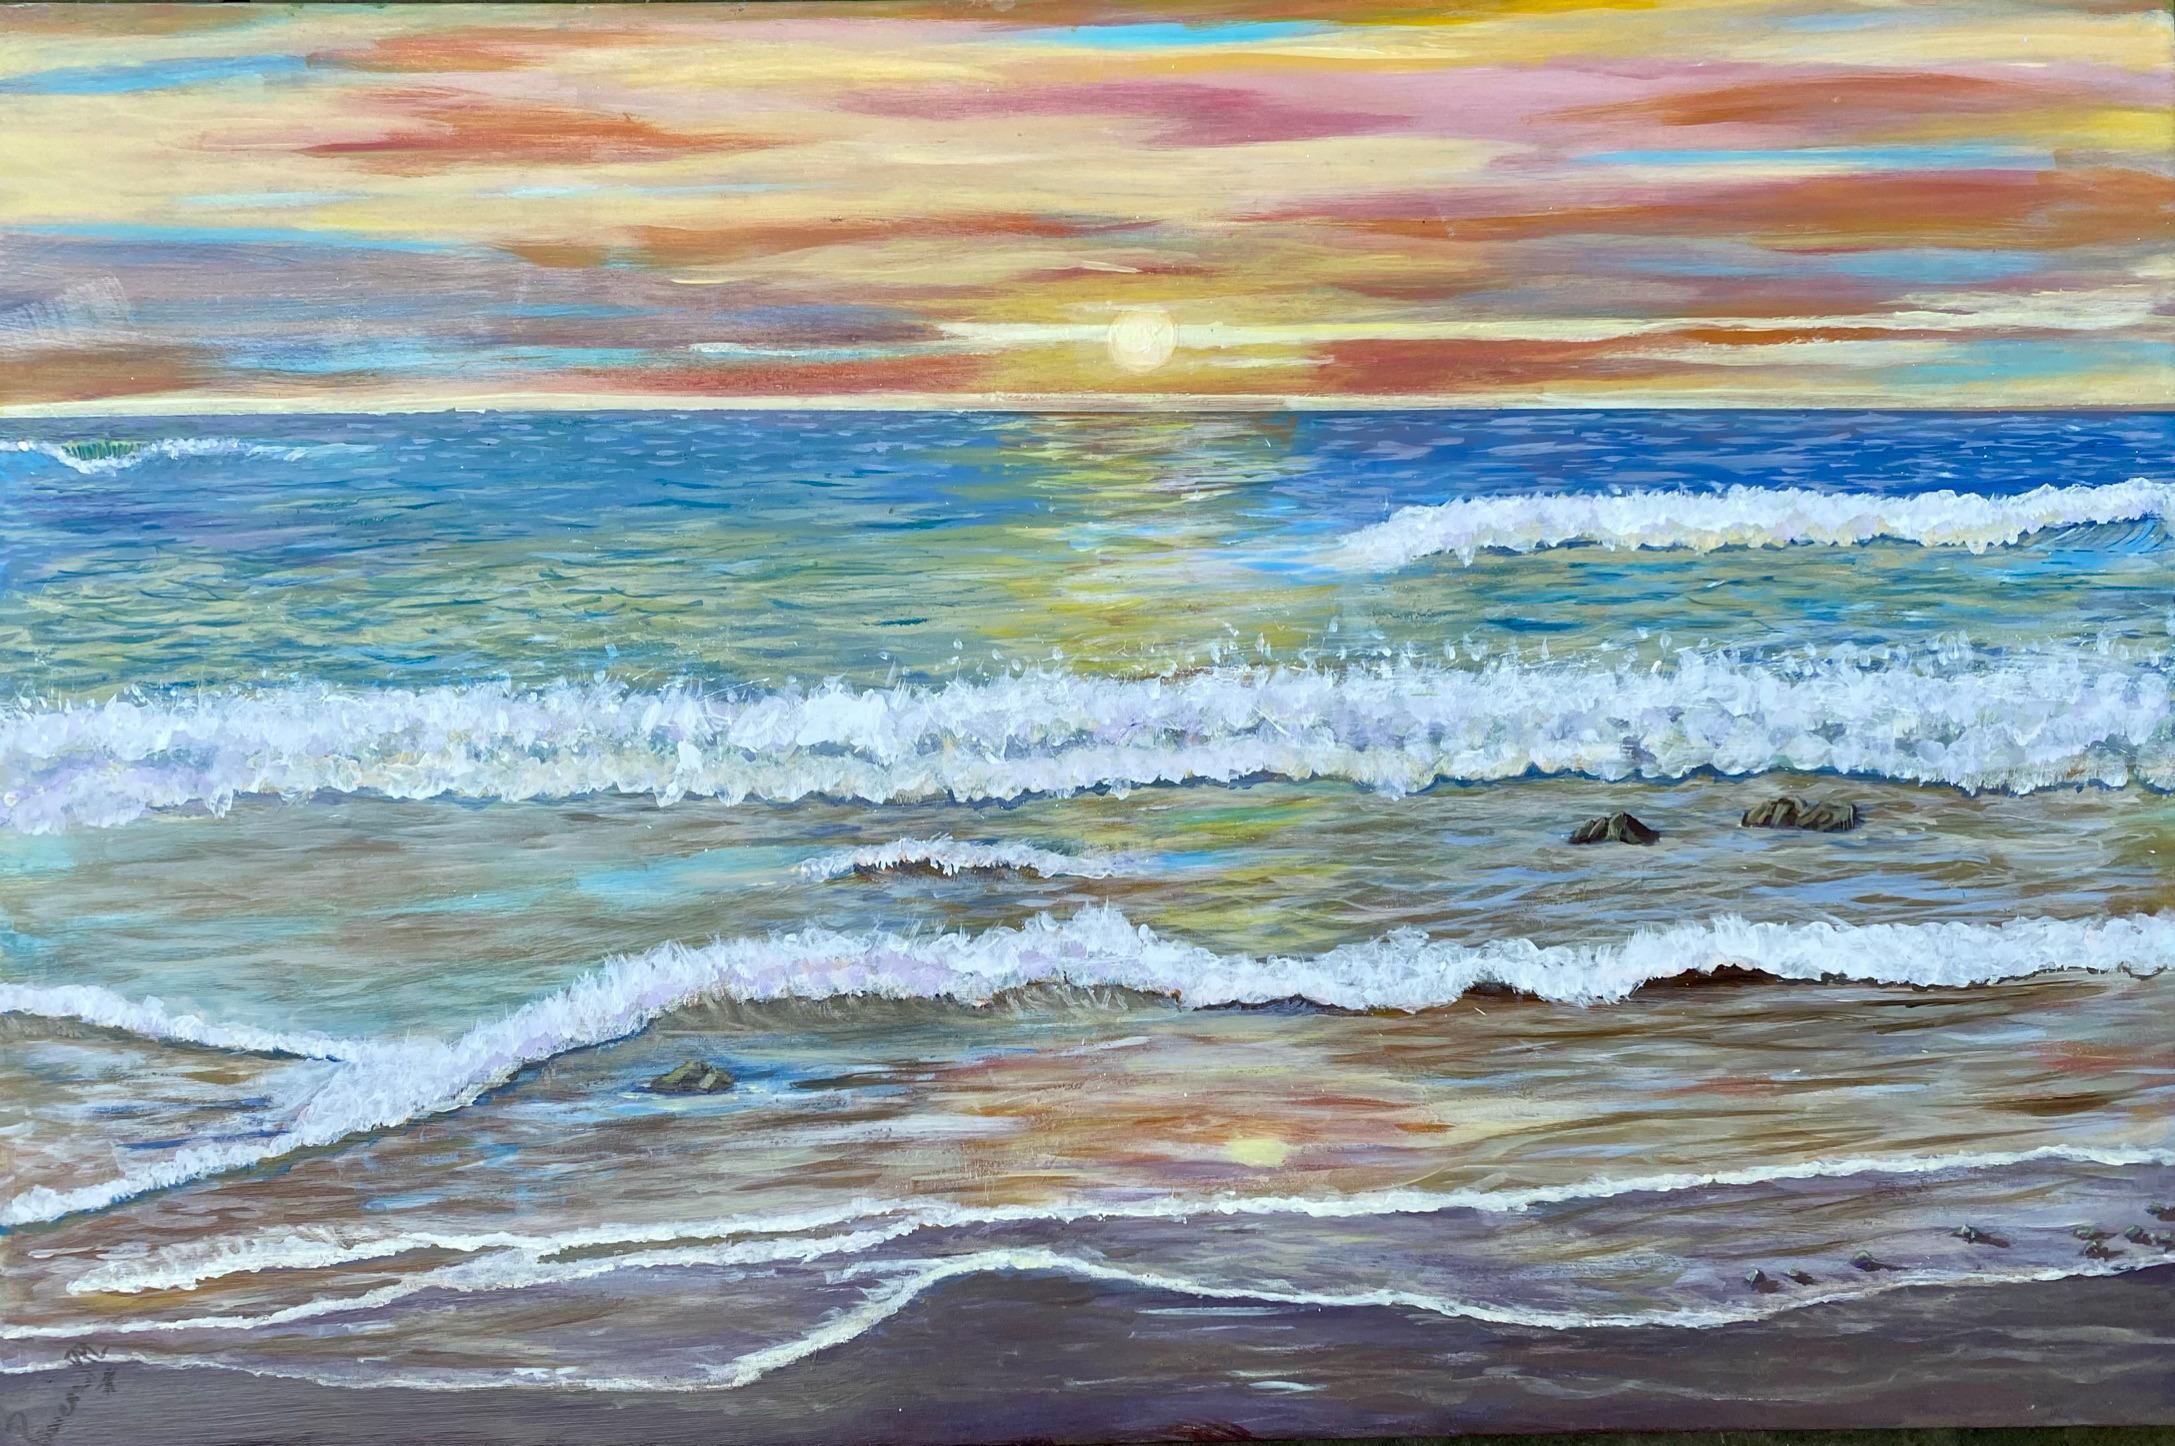 Sunset in punta hermosa beach puvot8